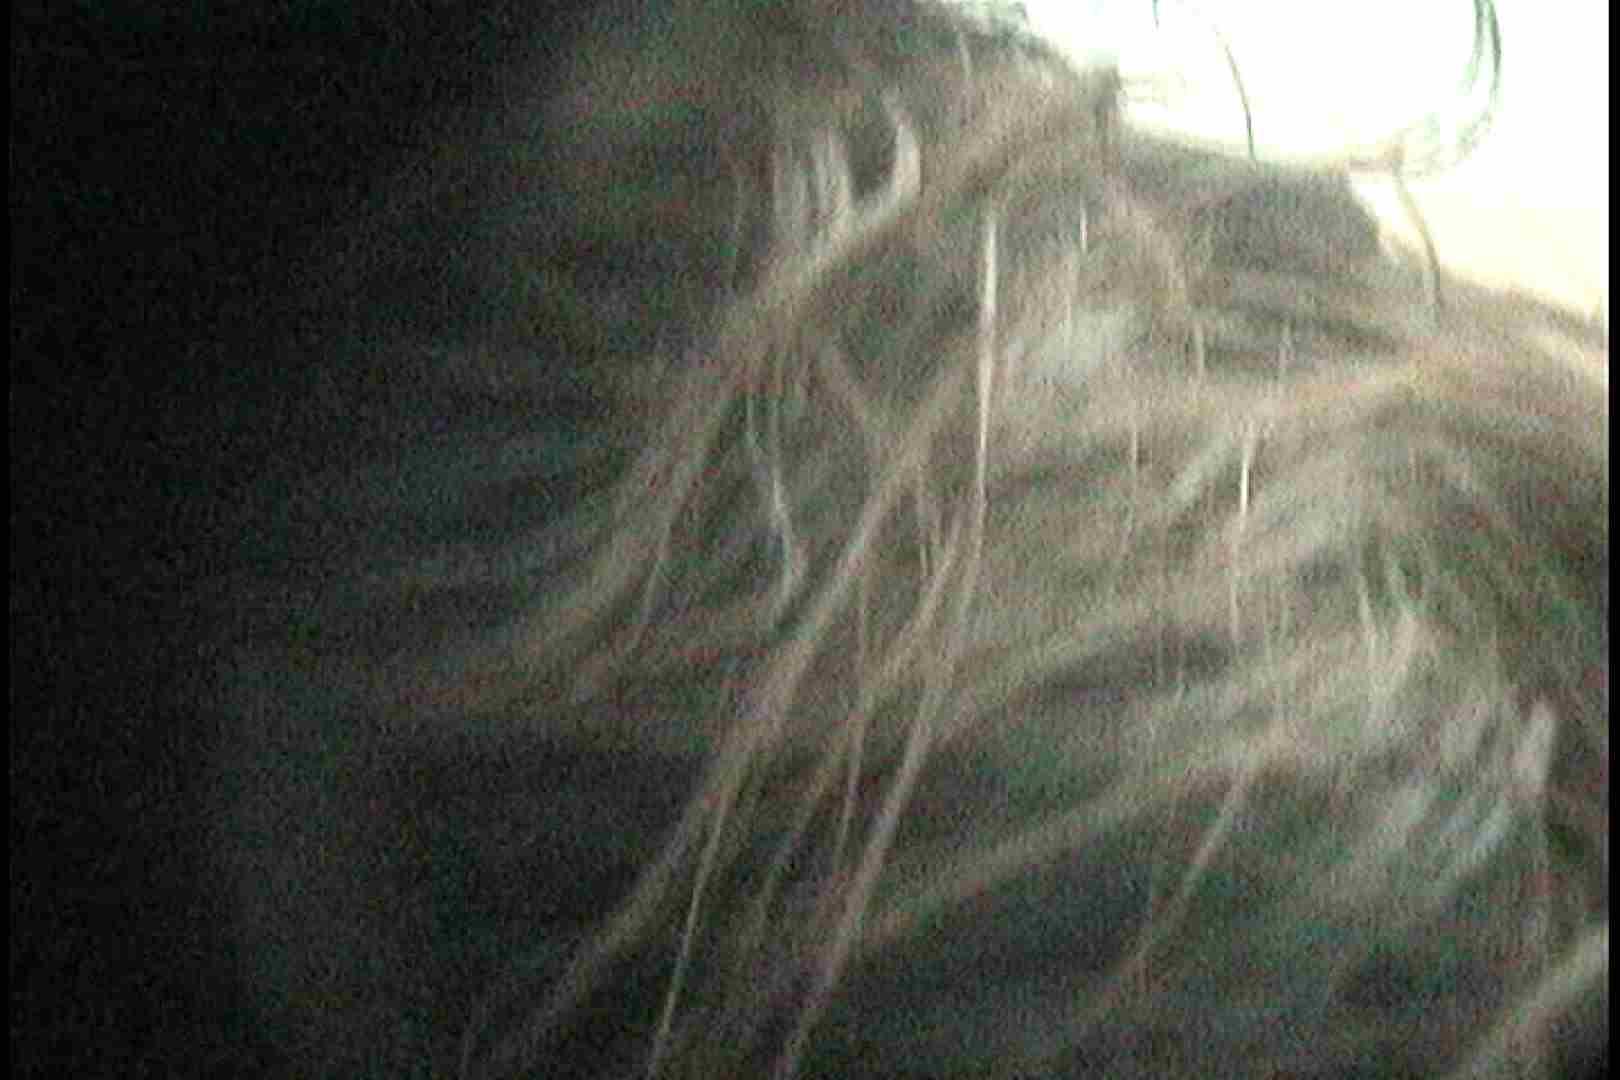 No.16 アニマル柄の水着 レースのパンツにナプキンを装着する金髪お女市さん 接写 隠し撮りオマンコ動画紹介 103連発 44